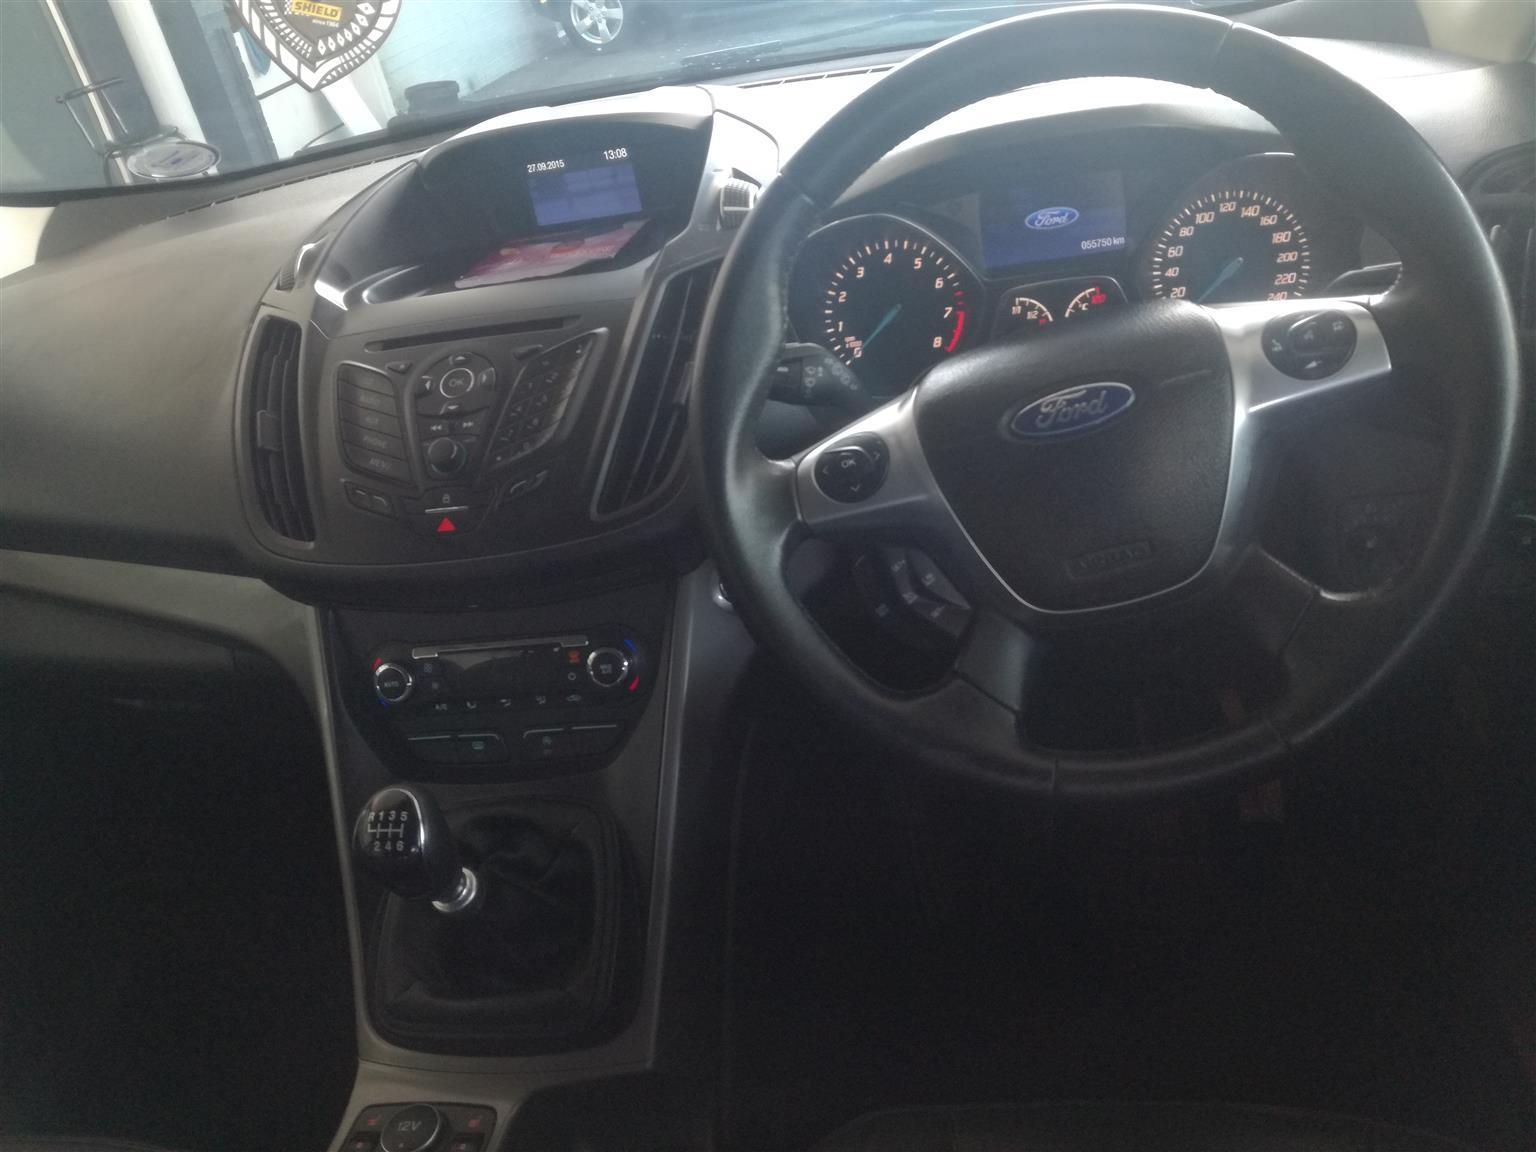 2012 Ford Kuga 1.6T AWD Titanium